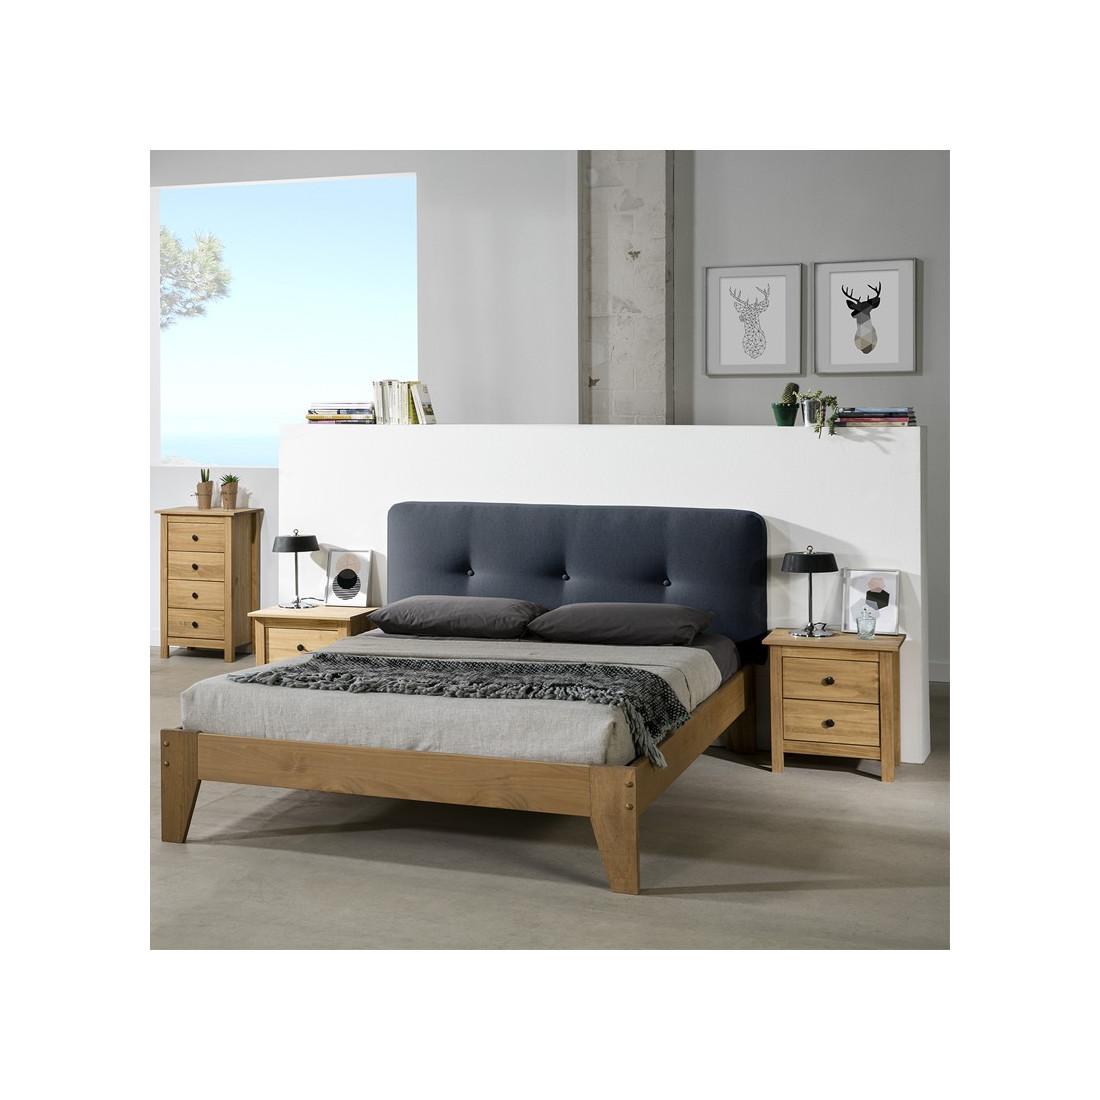 t te de lit tissu bleu 152 cm joey n 1 univers de la chambre. Black Bedroom Furniture Sets. Home Design Ideas